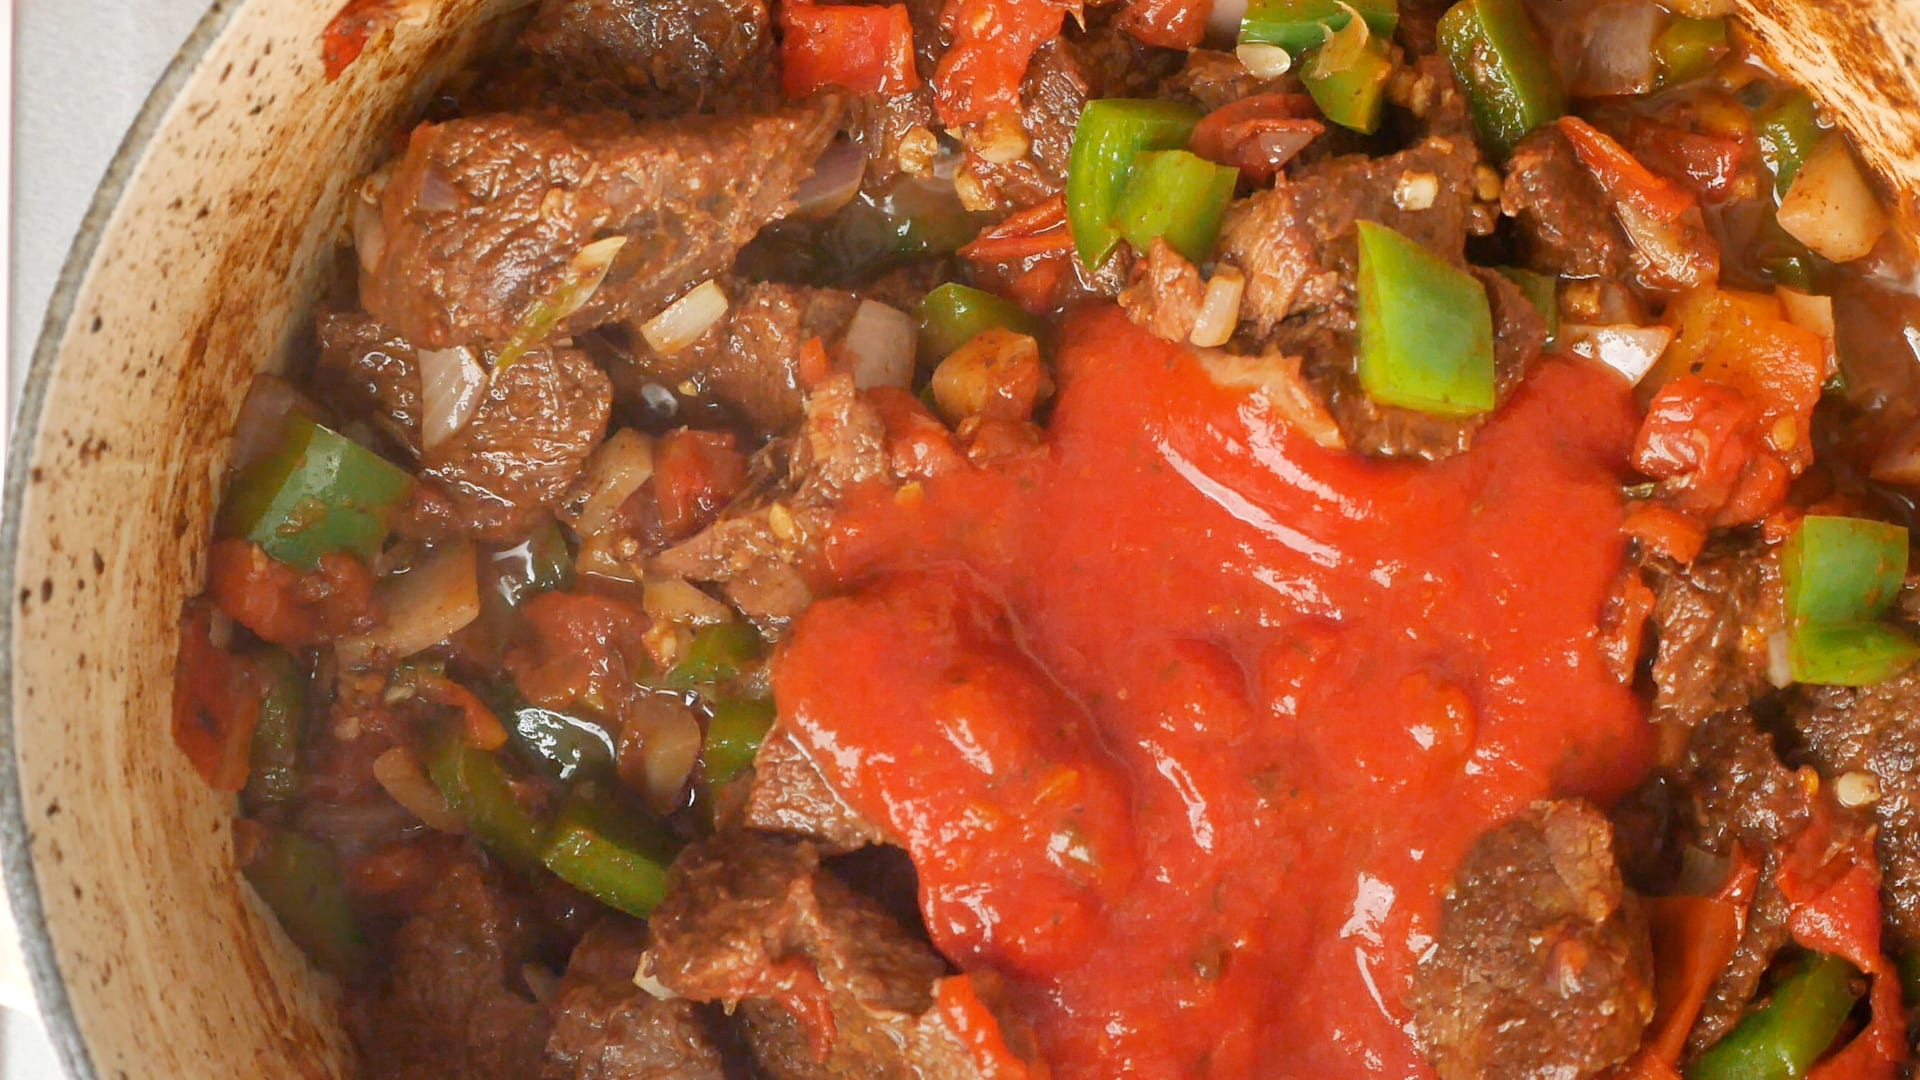 Adding tomato sauce to meat